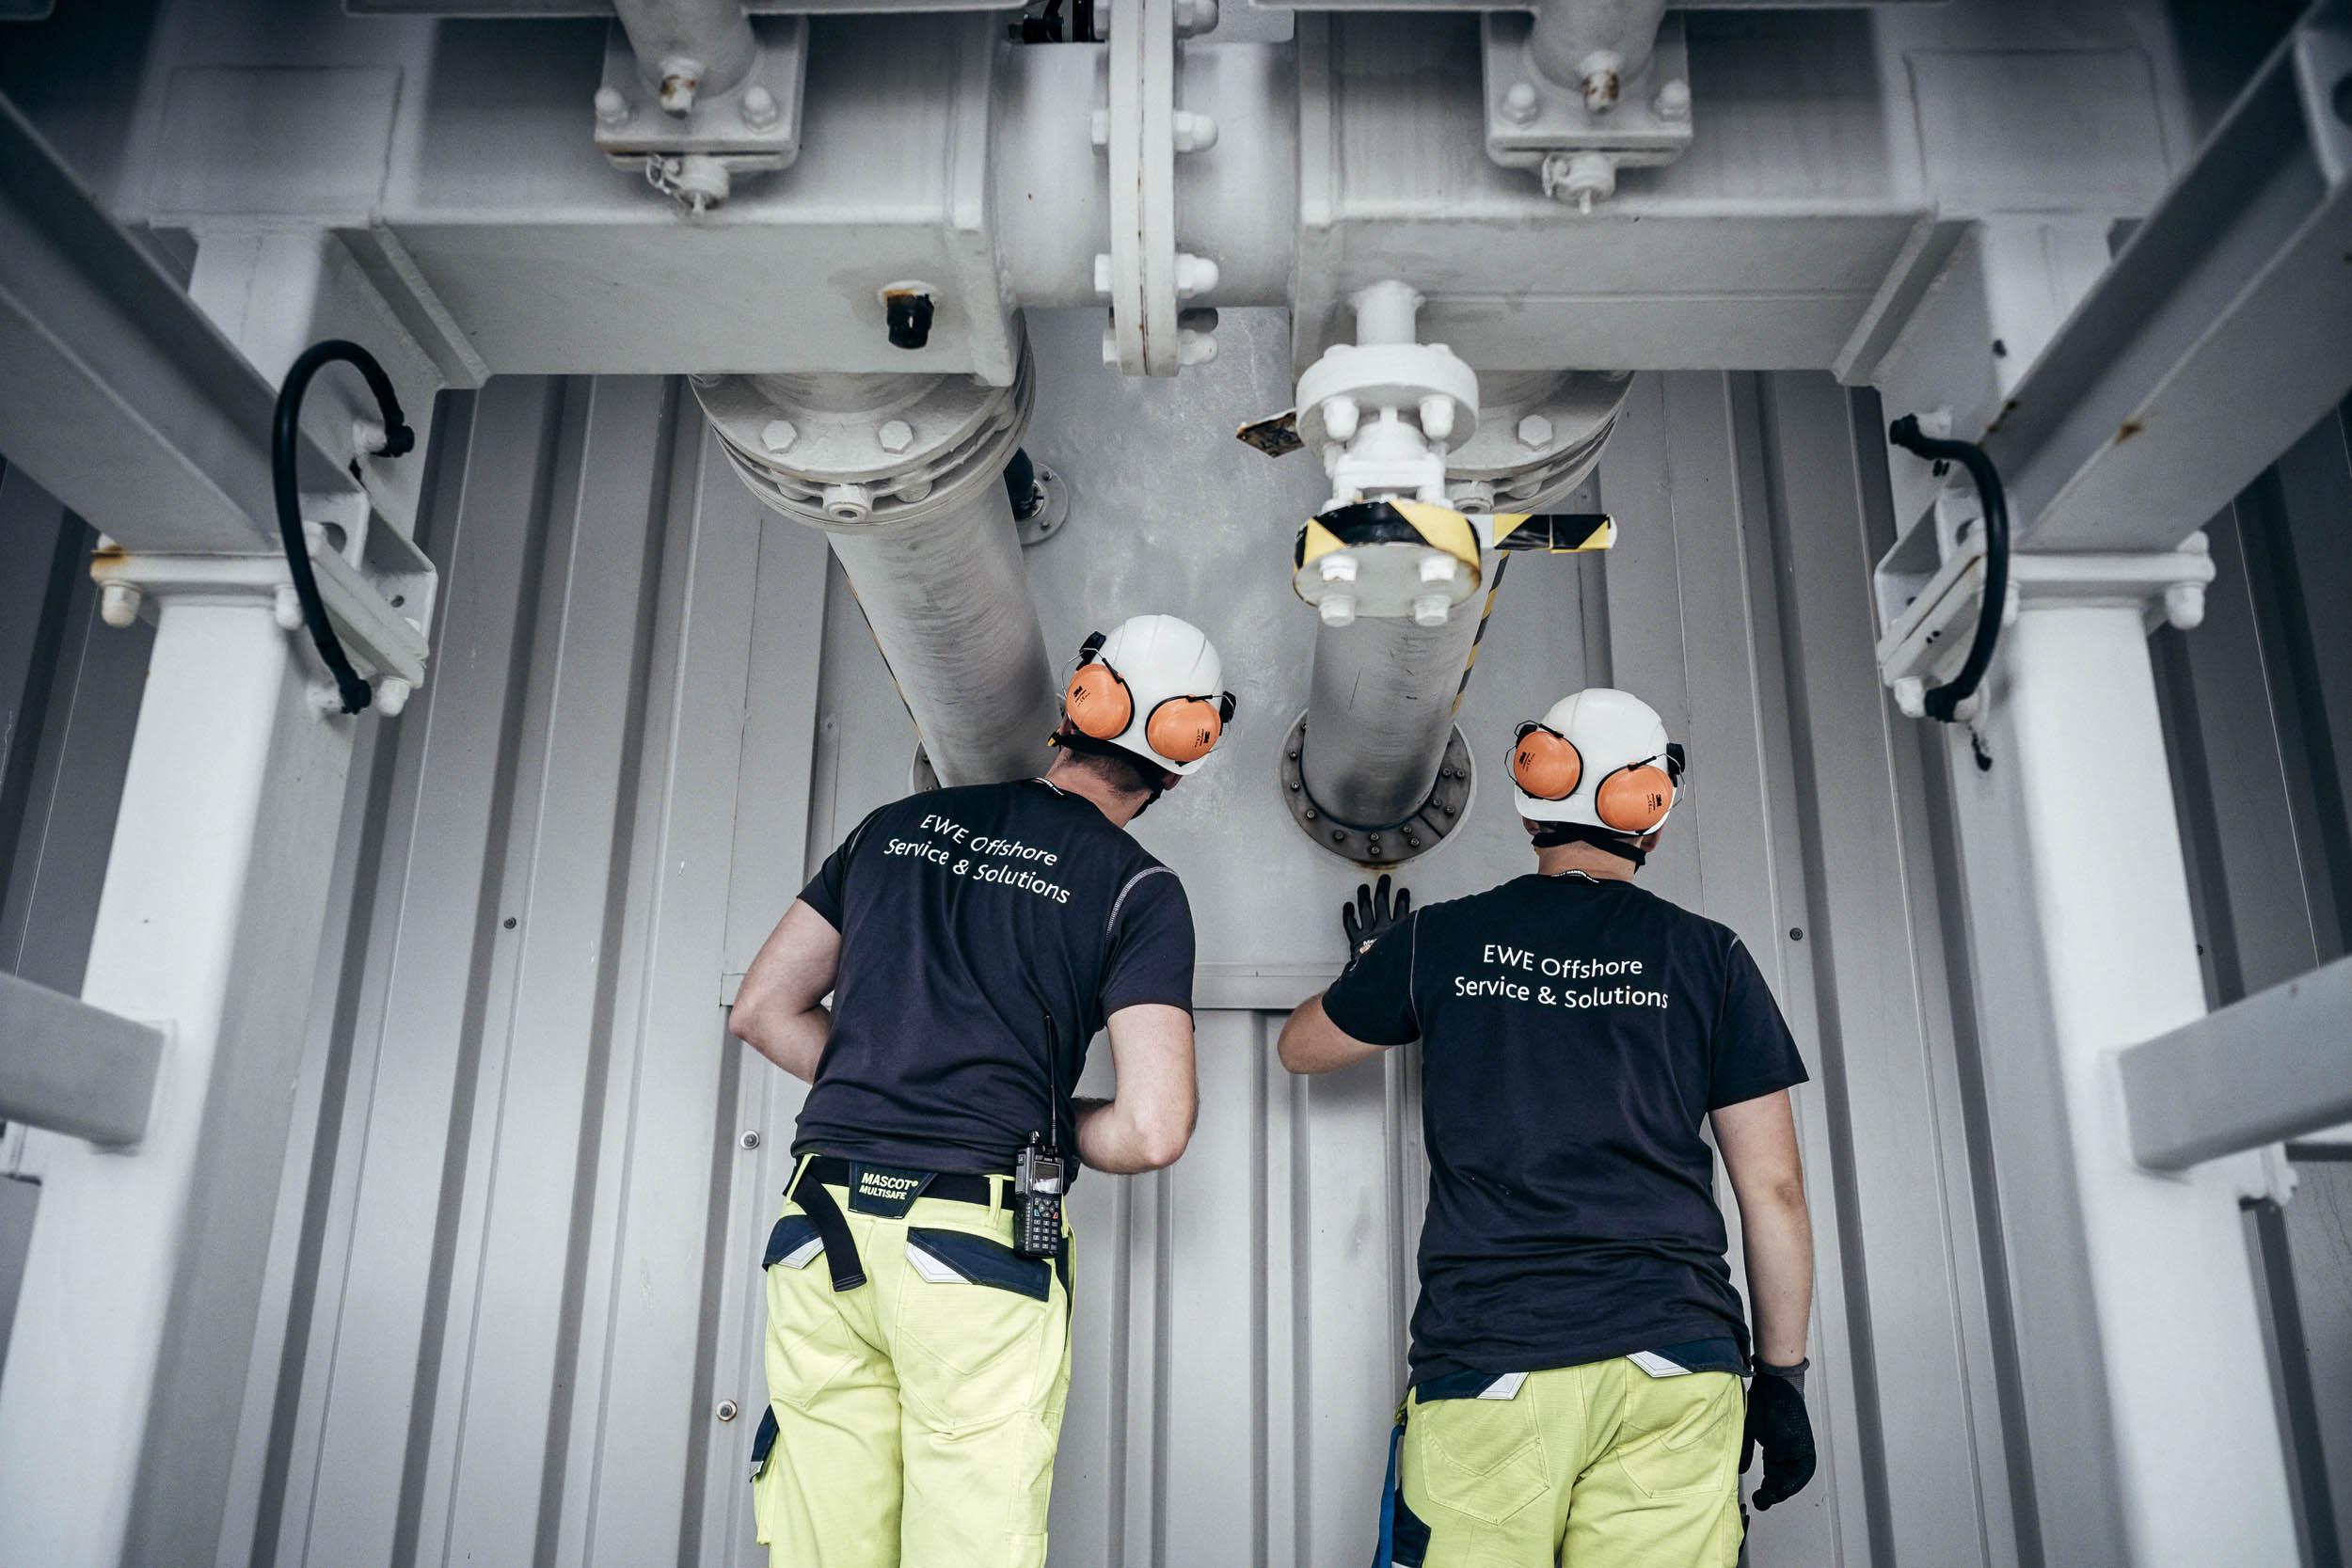 2019-SeifertUebler-EWE-offshore-windpower-019.jpg